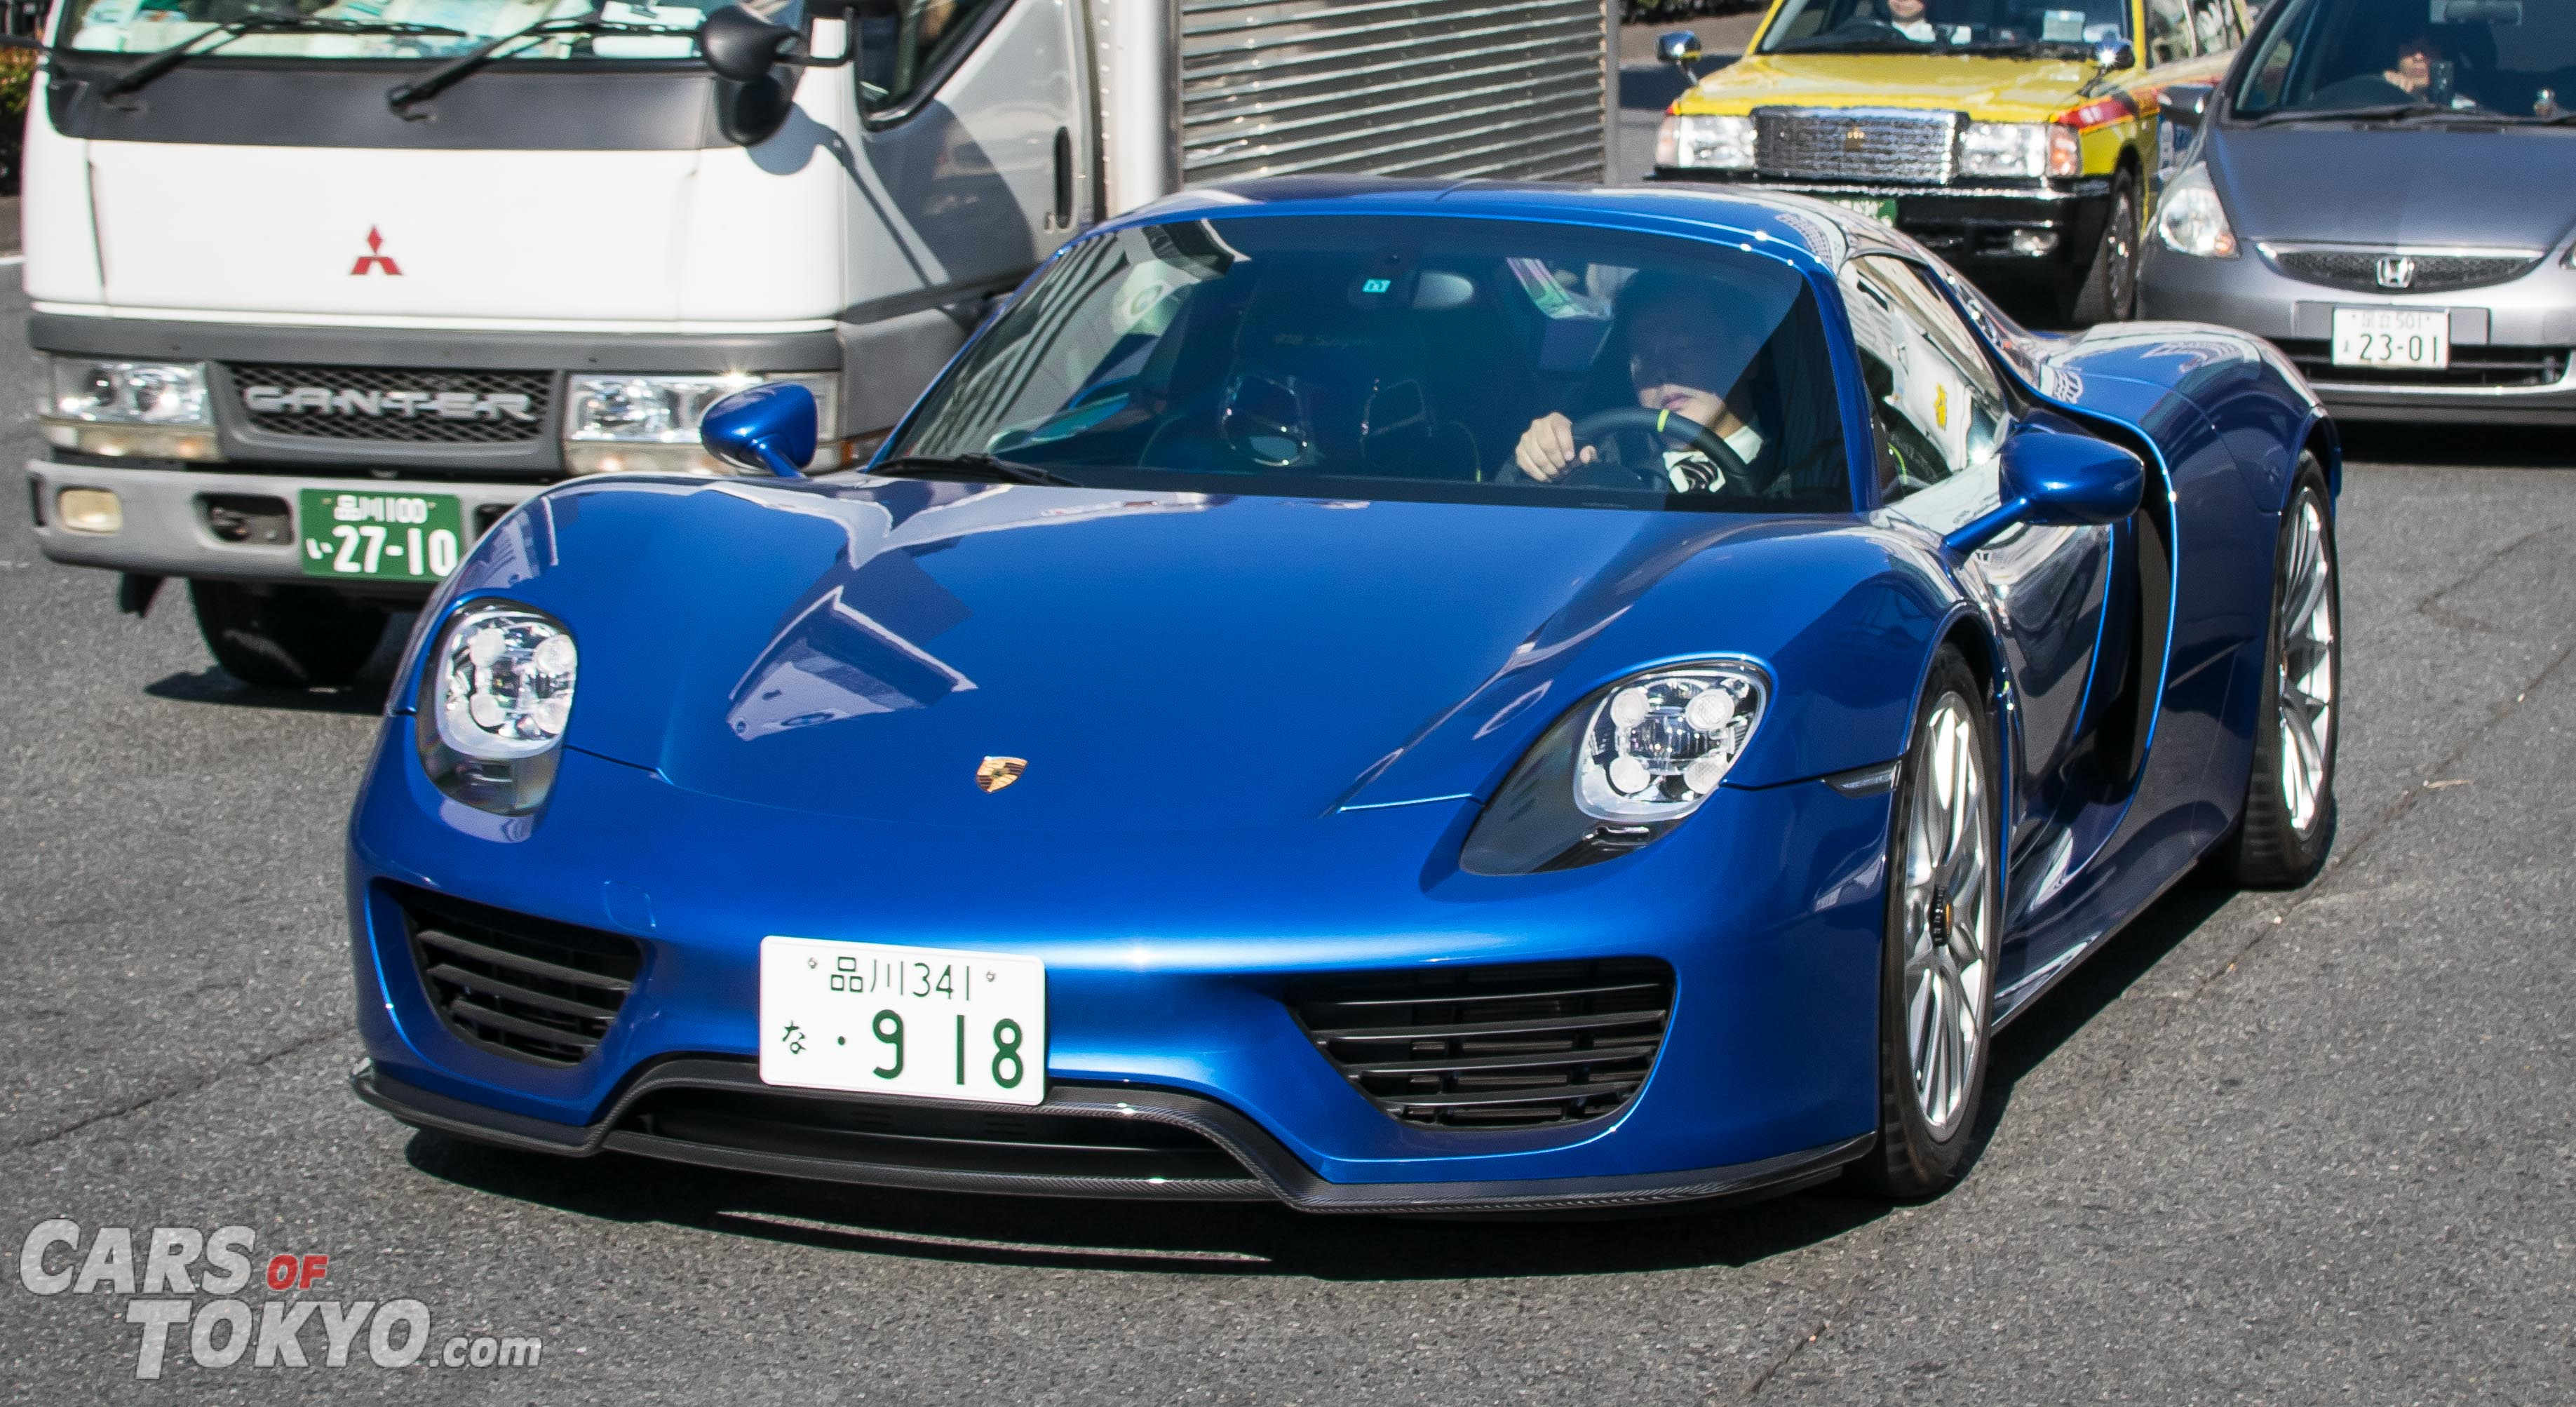 Cars of Tokyo Aoyama Porsche 918 Spyder